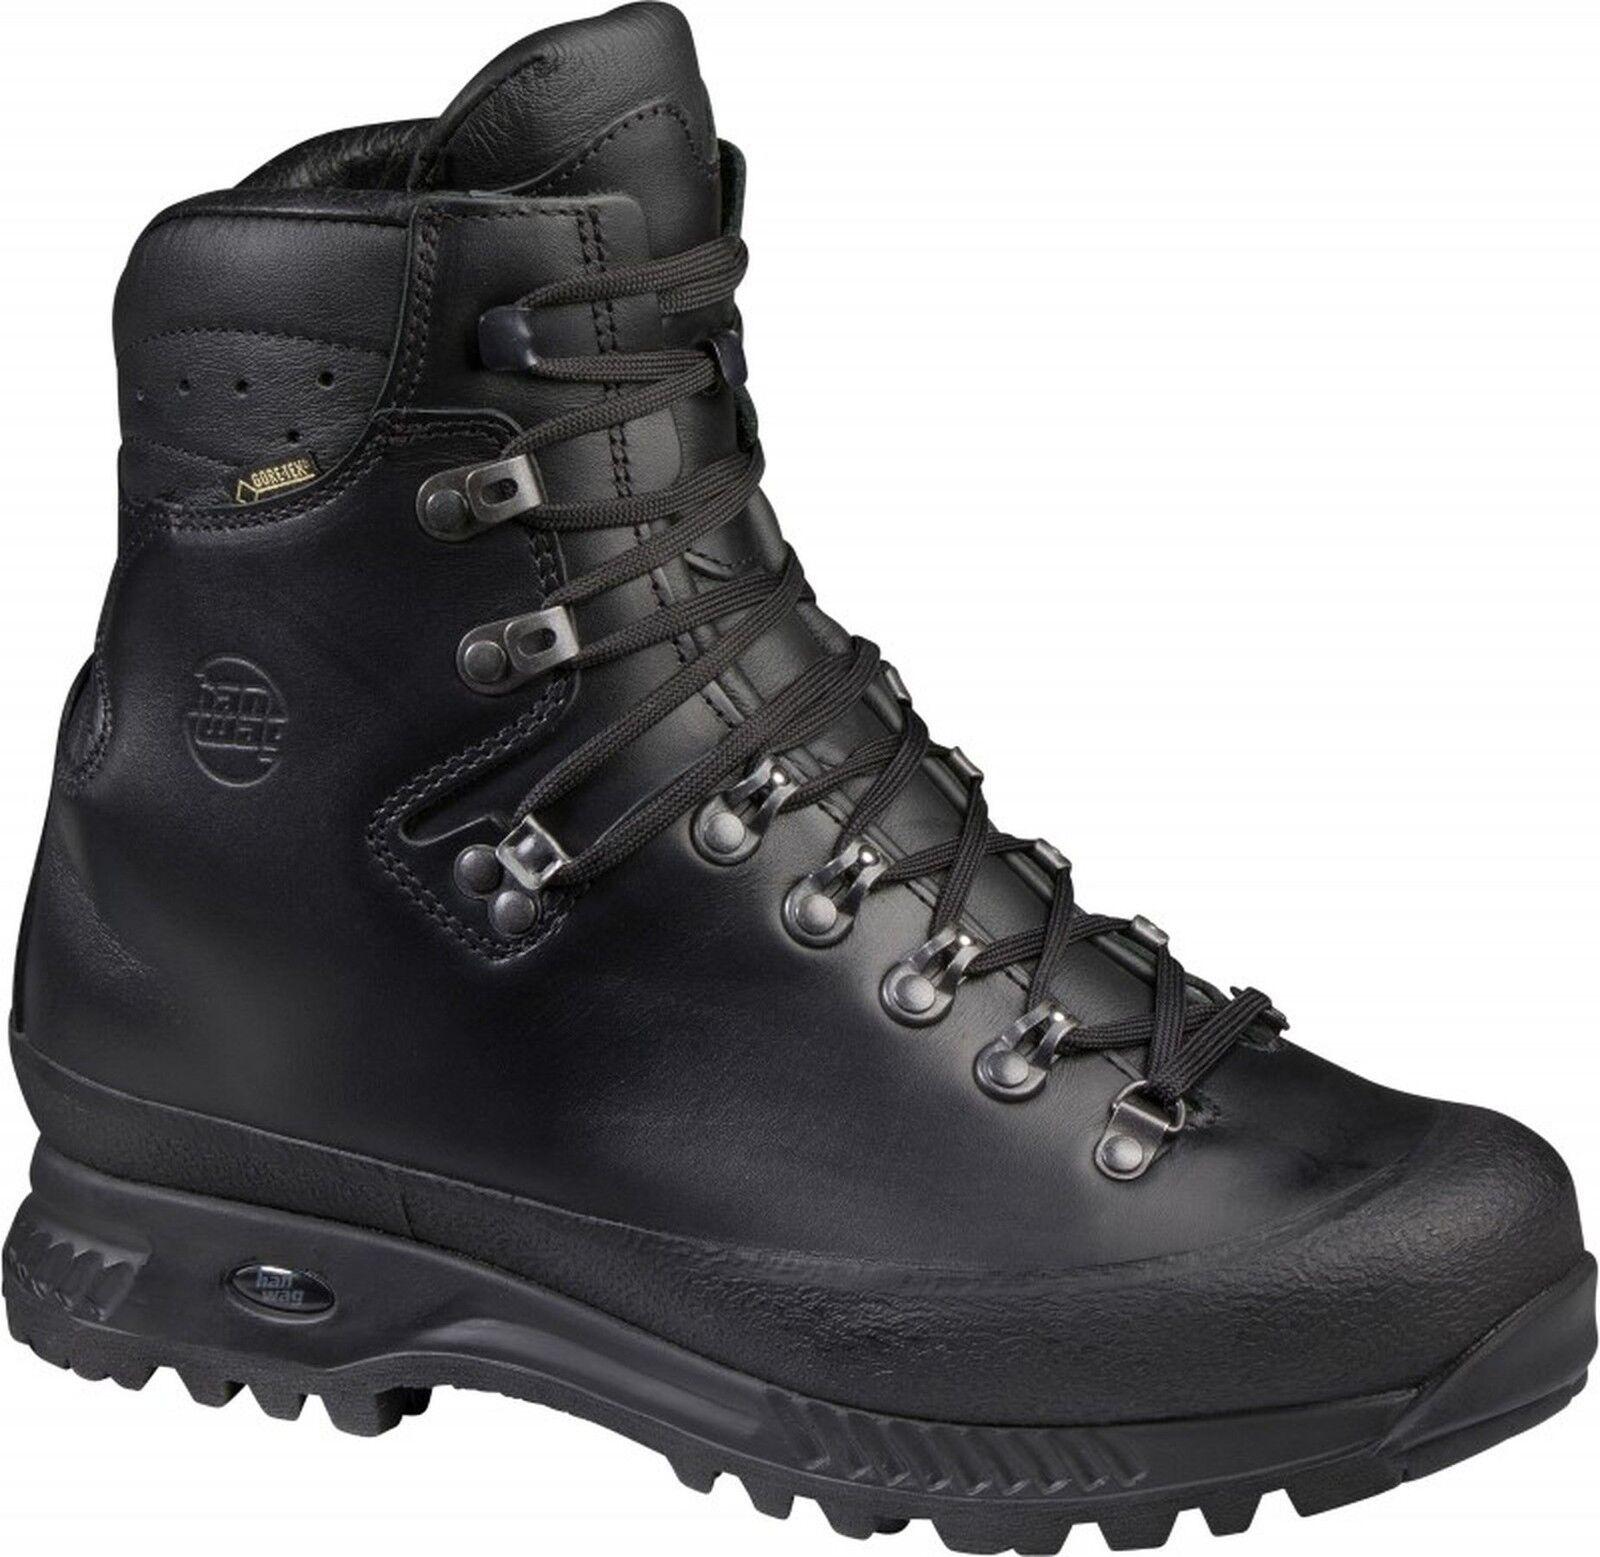 Hanwag Trekking & Bundeswehr Klassiker Alaska GTX Men Größe 8,5 - 42,5 black